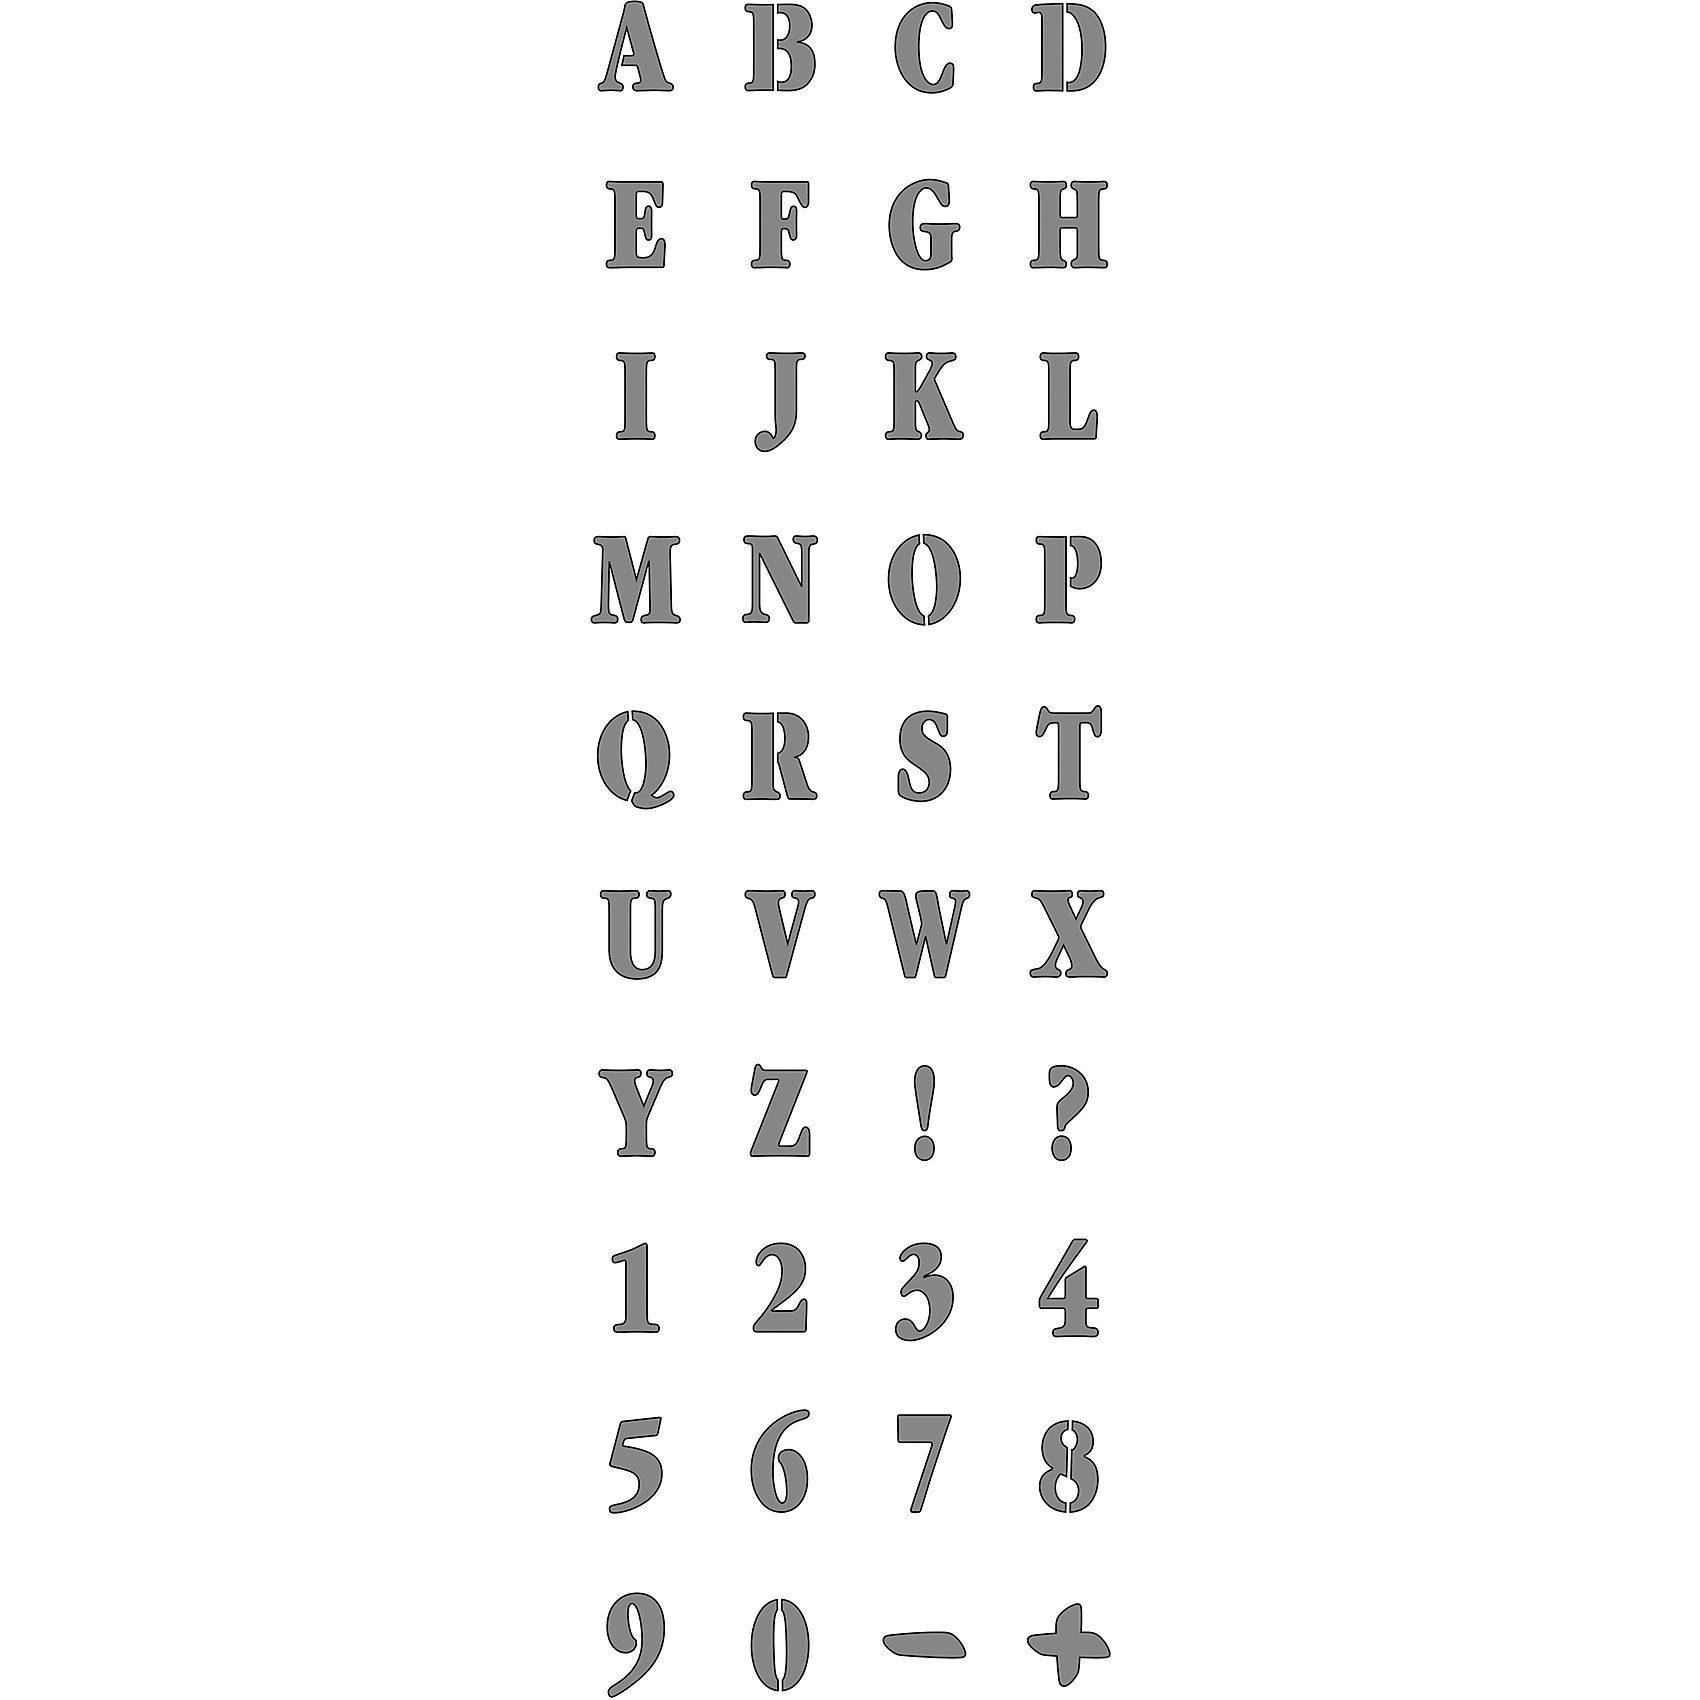 C. KREUL Feste Designschablone Alphabet, 13 x 40 cm